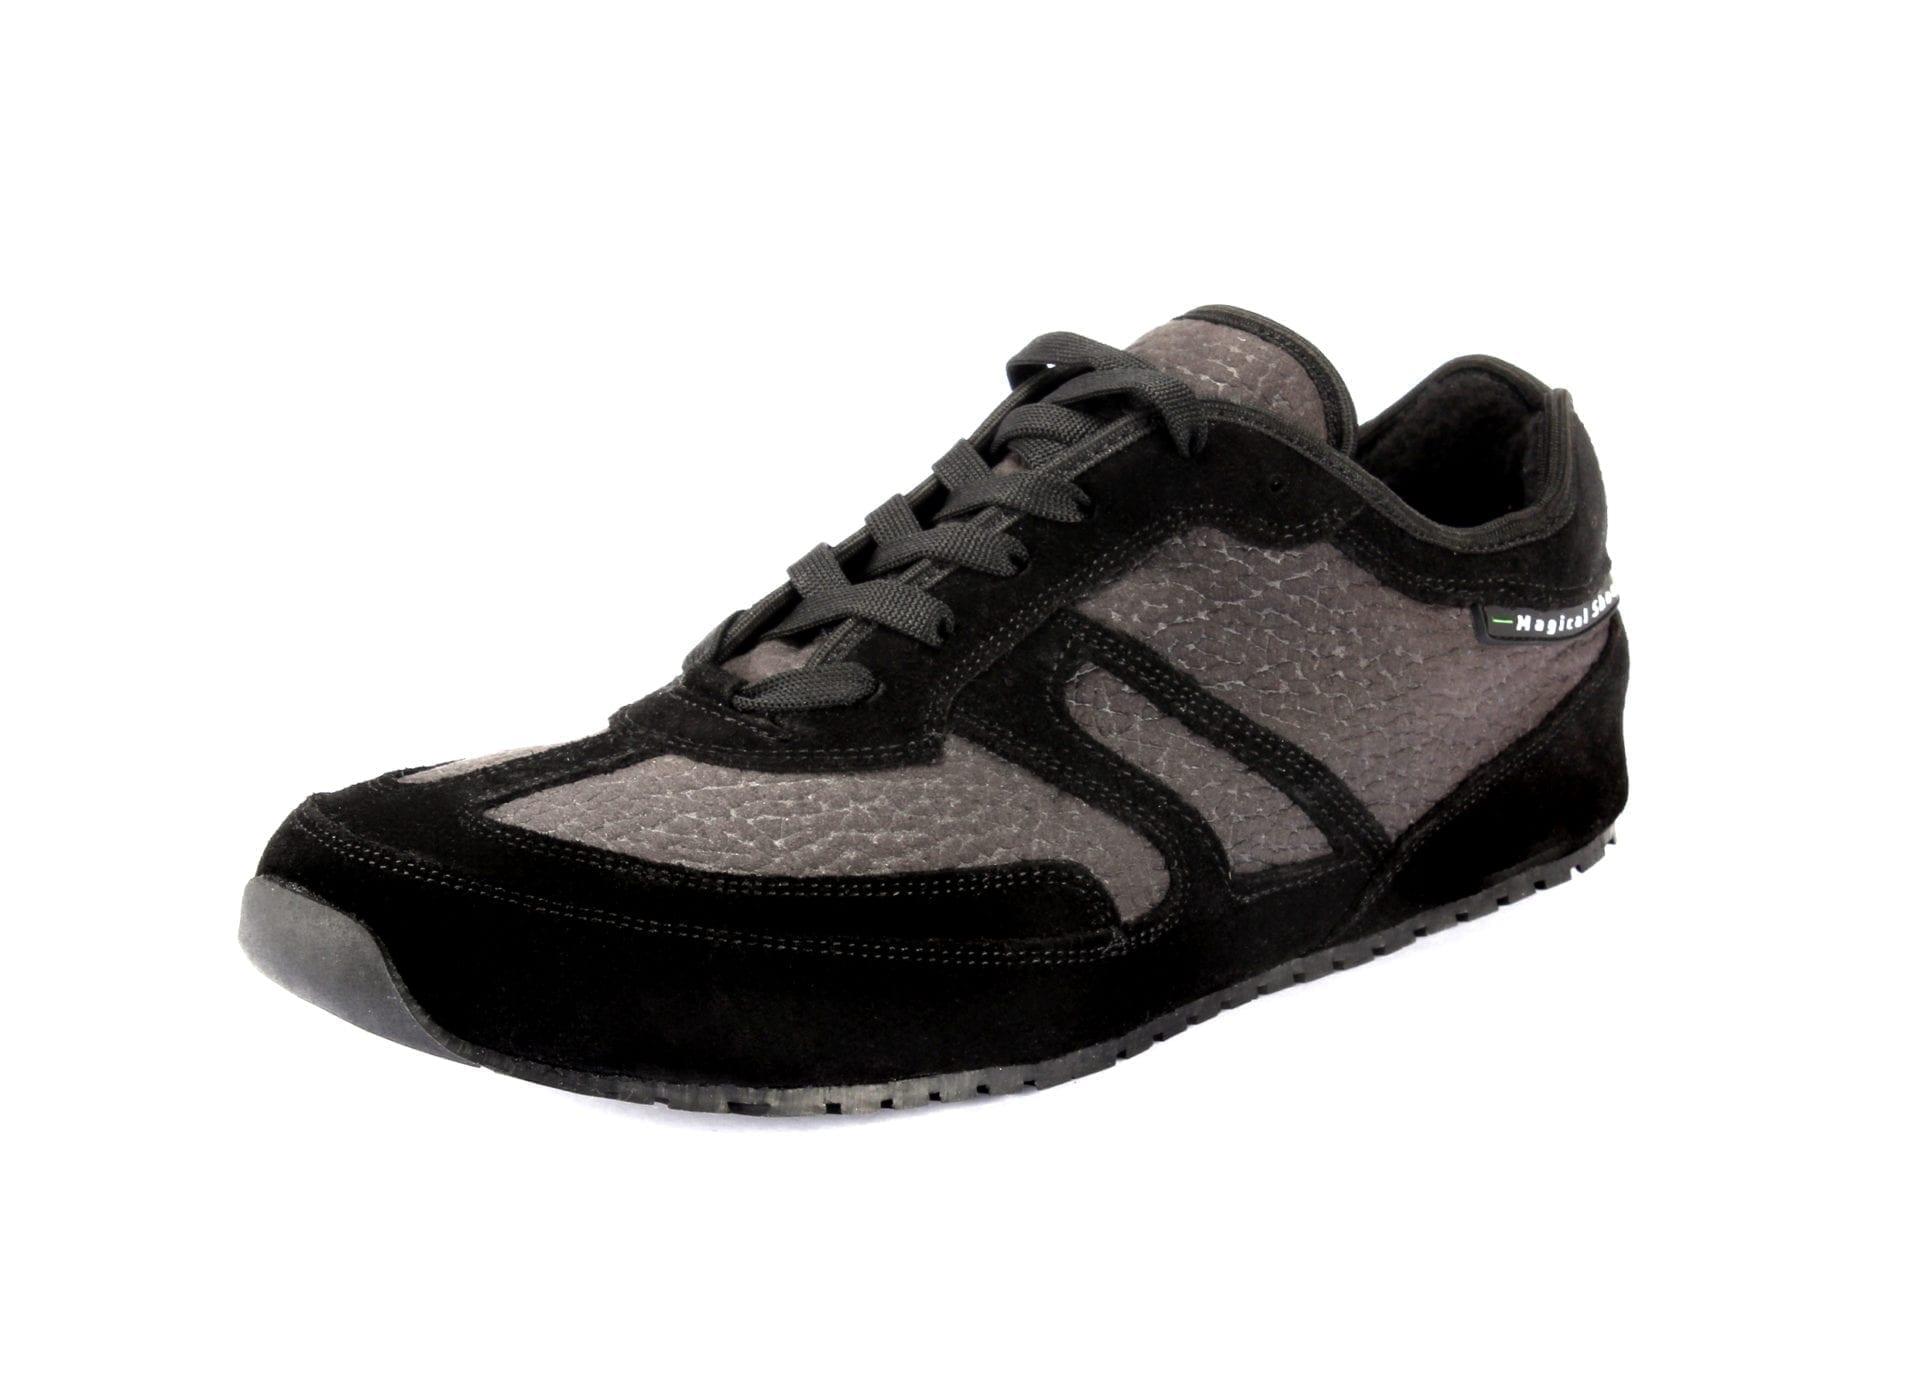 Magical Shoes BAREFOOT SHOES EXPLORER AUTUMN BARIBAL picture 3